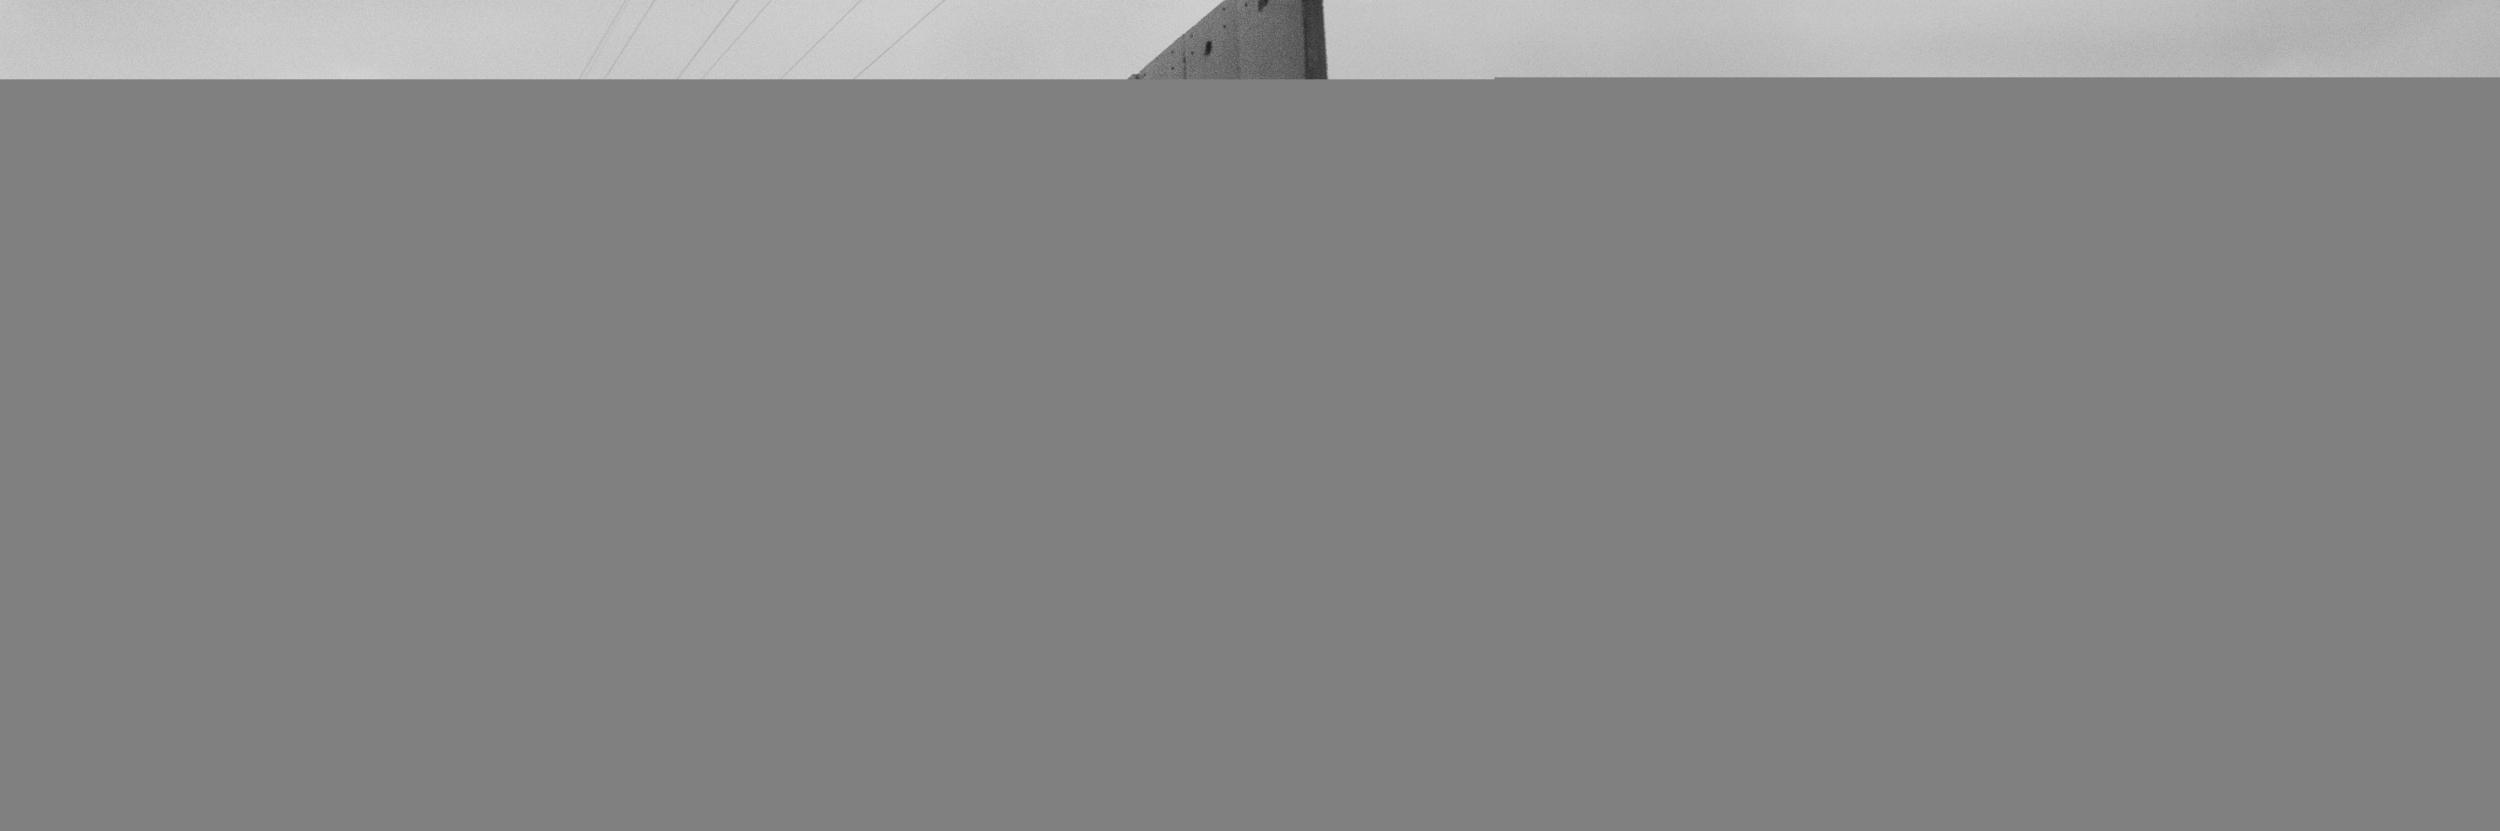 Josef Koudelka (Czech, born 1938). Detail from Wall: Israeli & Palestinian Landscape 2008-2012 (Shu'fat refugee camp, overlooking Al 'Isawiya, Jerusalem), 2008–12. Pigment print, 32 7/8 x 100 in. (83.5 x 254 cm). © Josef Koudelka/Magnum Photos